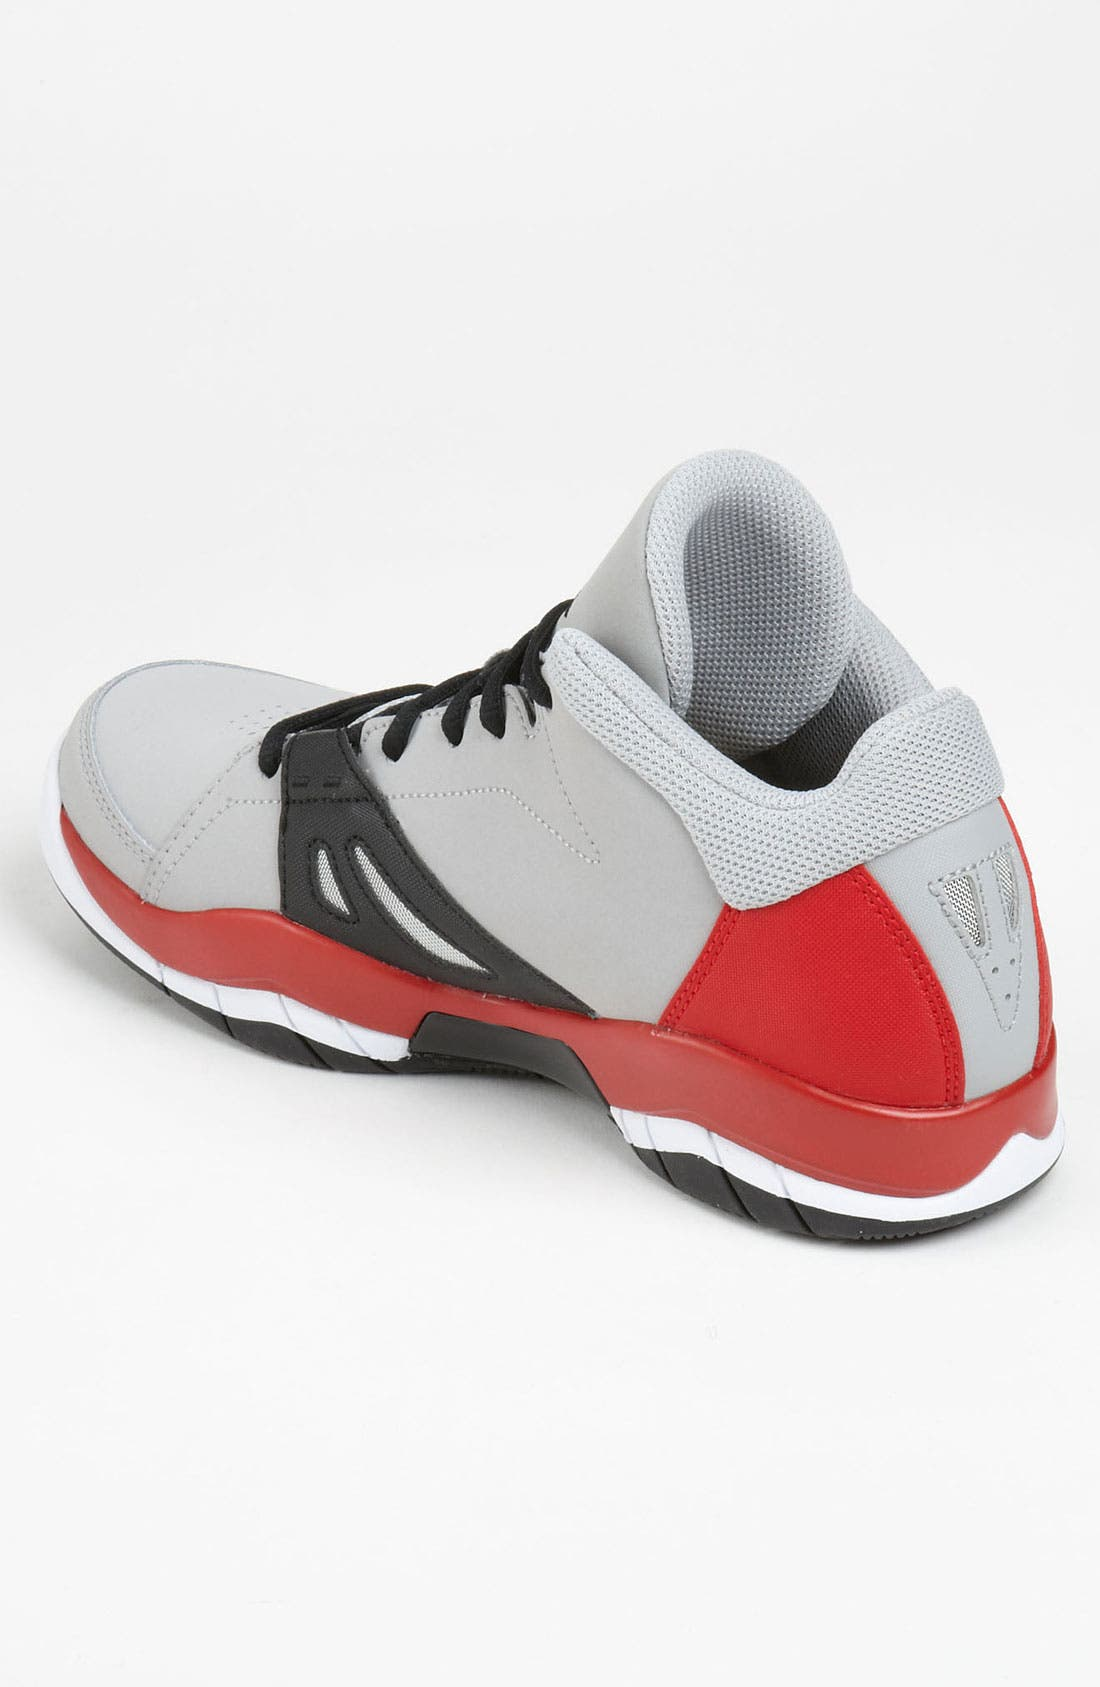 Alternate Image 2  - Nike 'Jordan Ace 23' Basketball Shoe (Big Kid)